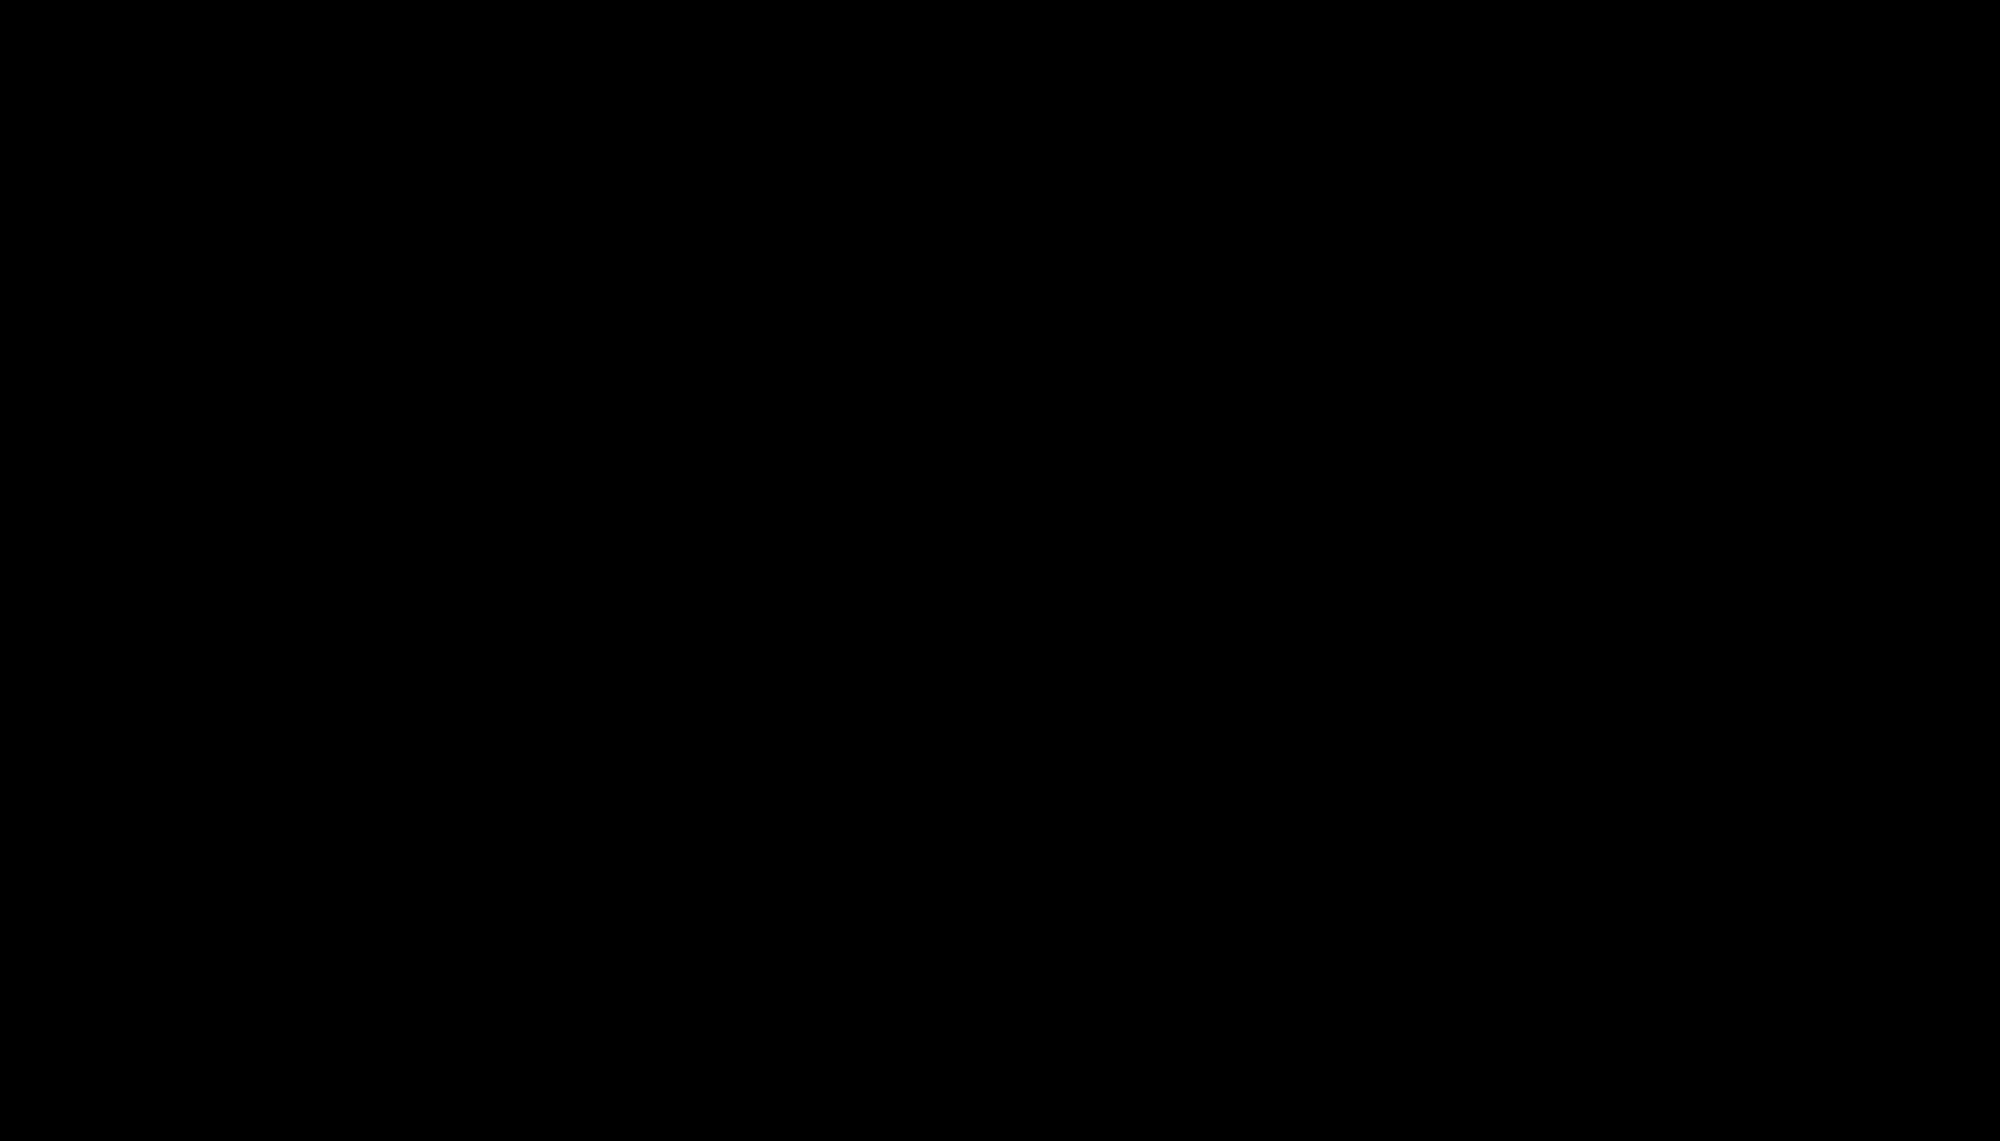 Google-Ergebnis für https://upload.wikimedia.org/wikipedia/commons/thumb/a/a9/Nespresso-logo.svg/2000px-Nespresso-logo.svg.png